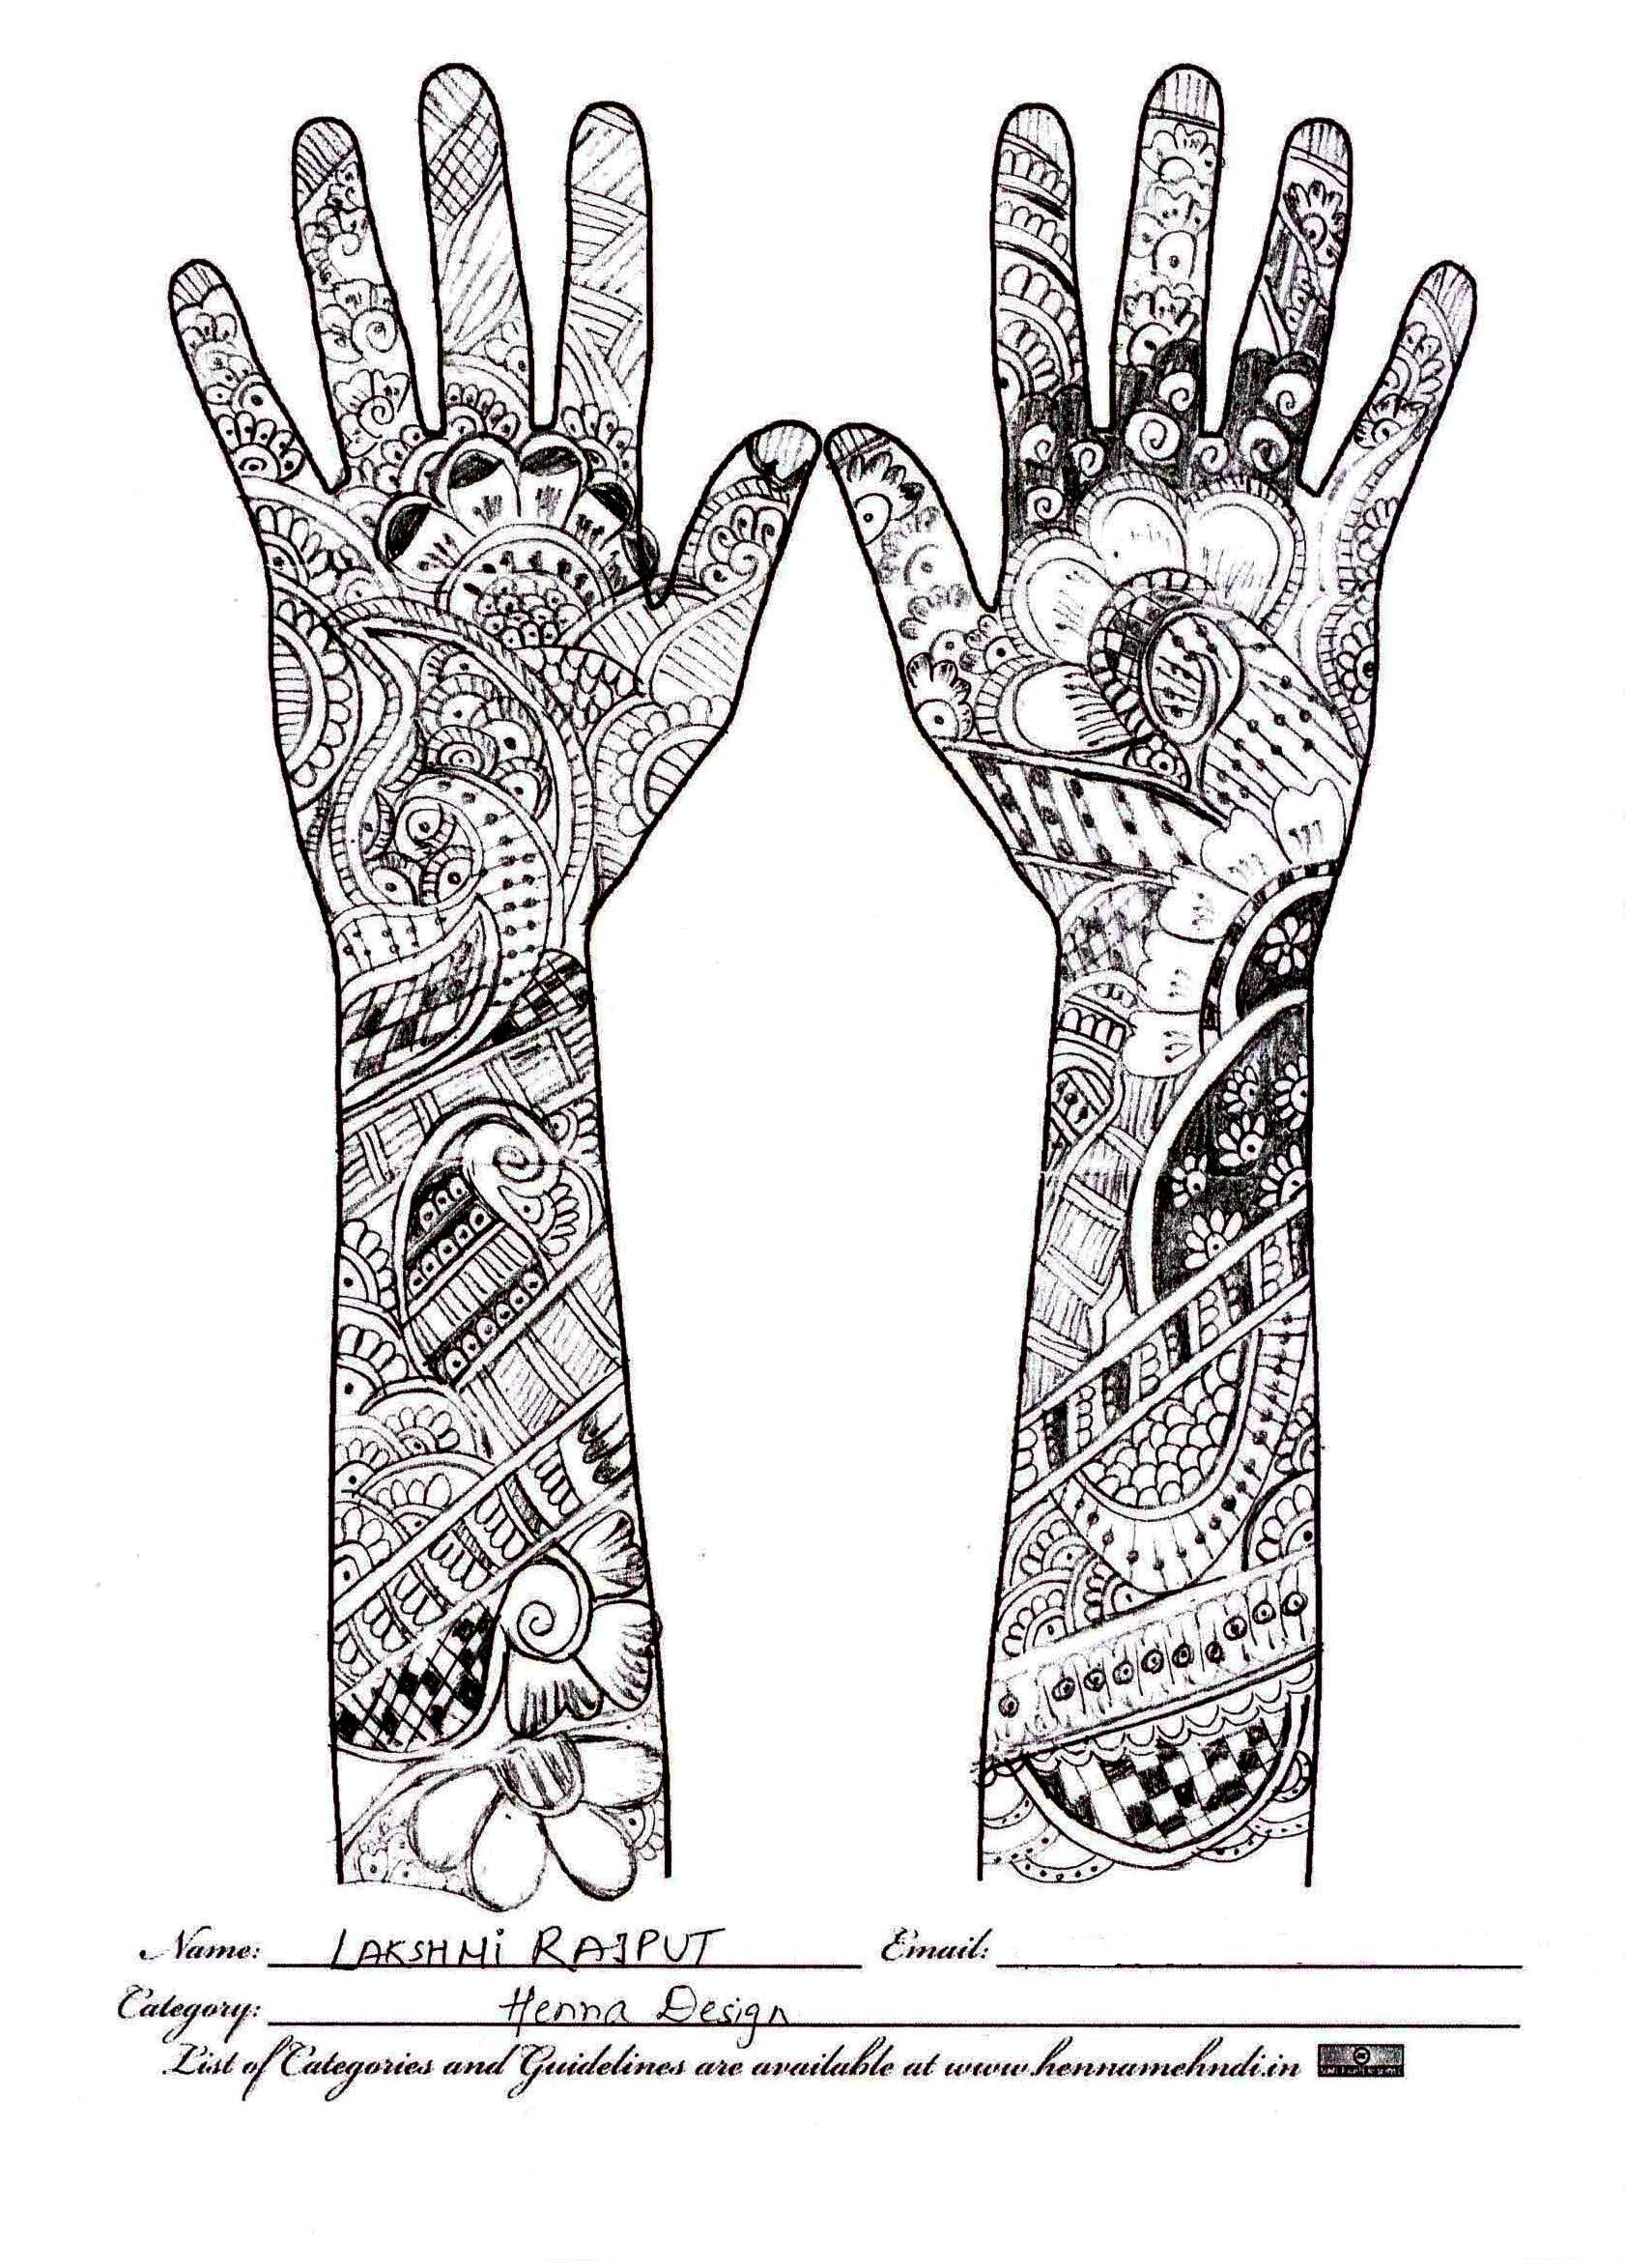 henna design tatto pinterest figuras humanas colorear y mandalas. Black Bedroom Furniture Sets. Home Design Ideas